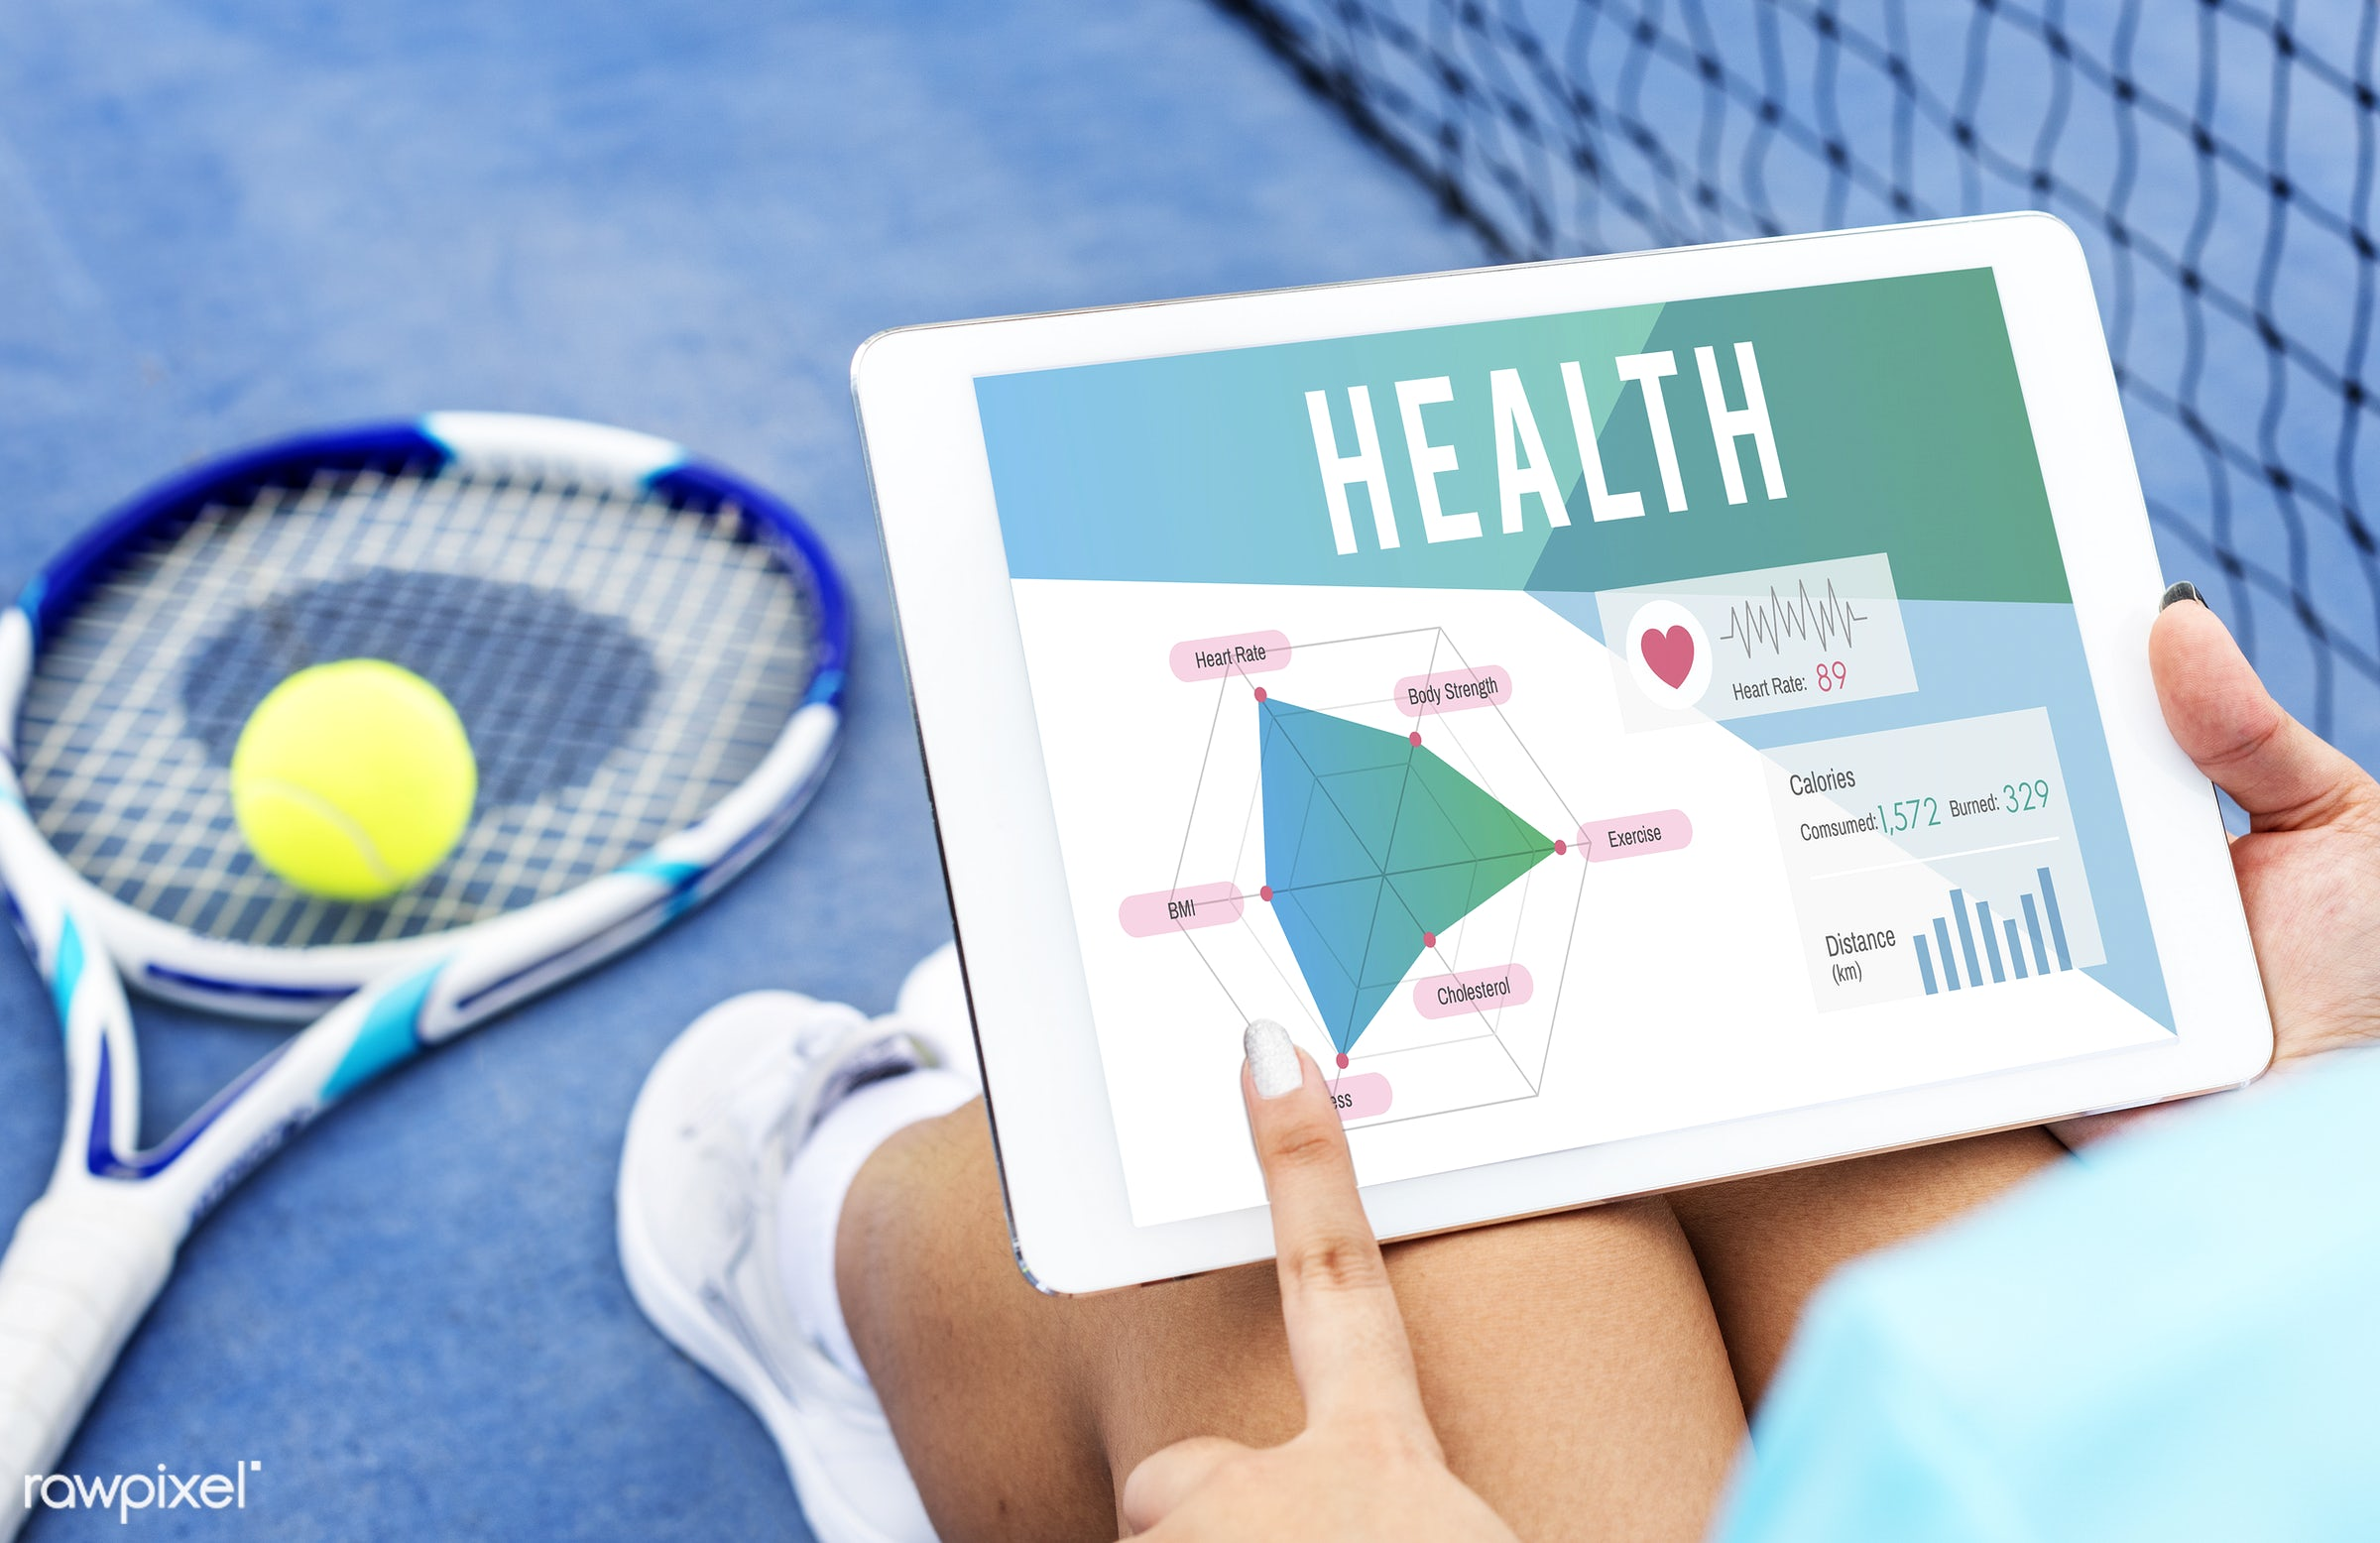 activity, analysis, aspiration, athlete, balance, ball, burn, diagram, endurance, exercise, female, fitness, goal, health,...